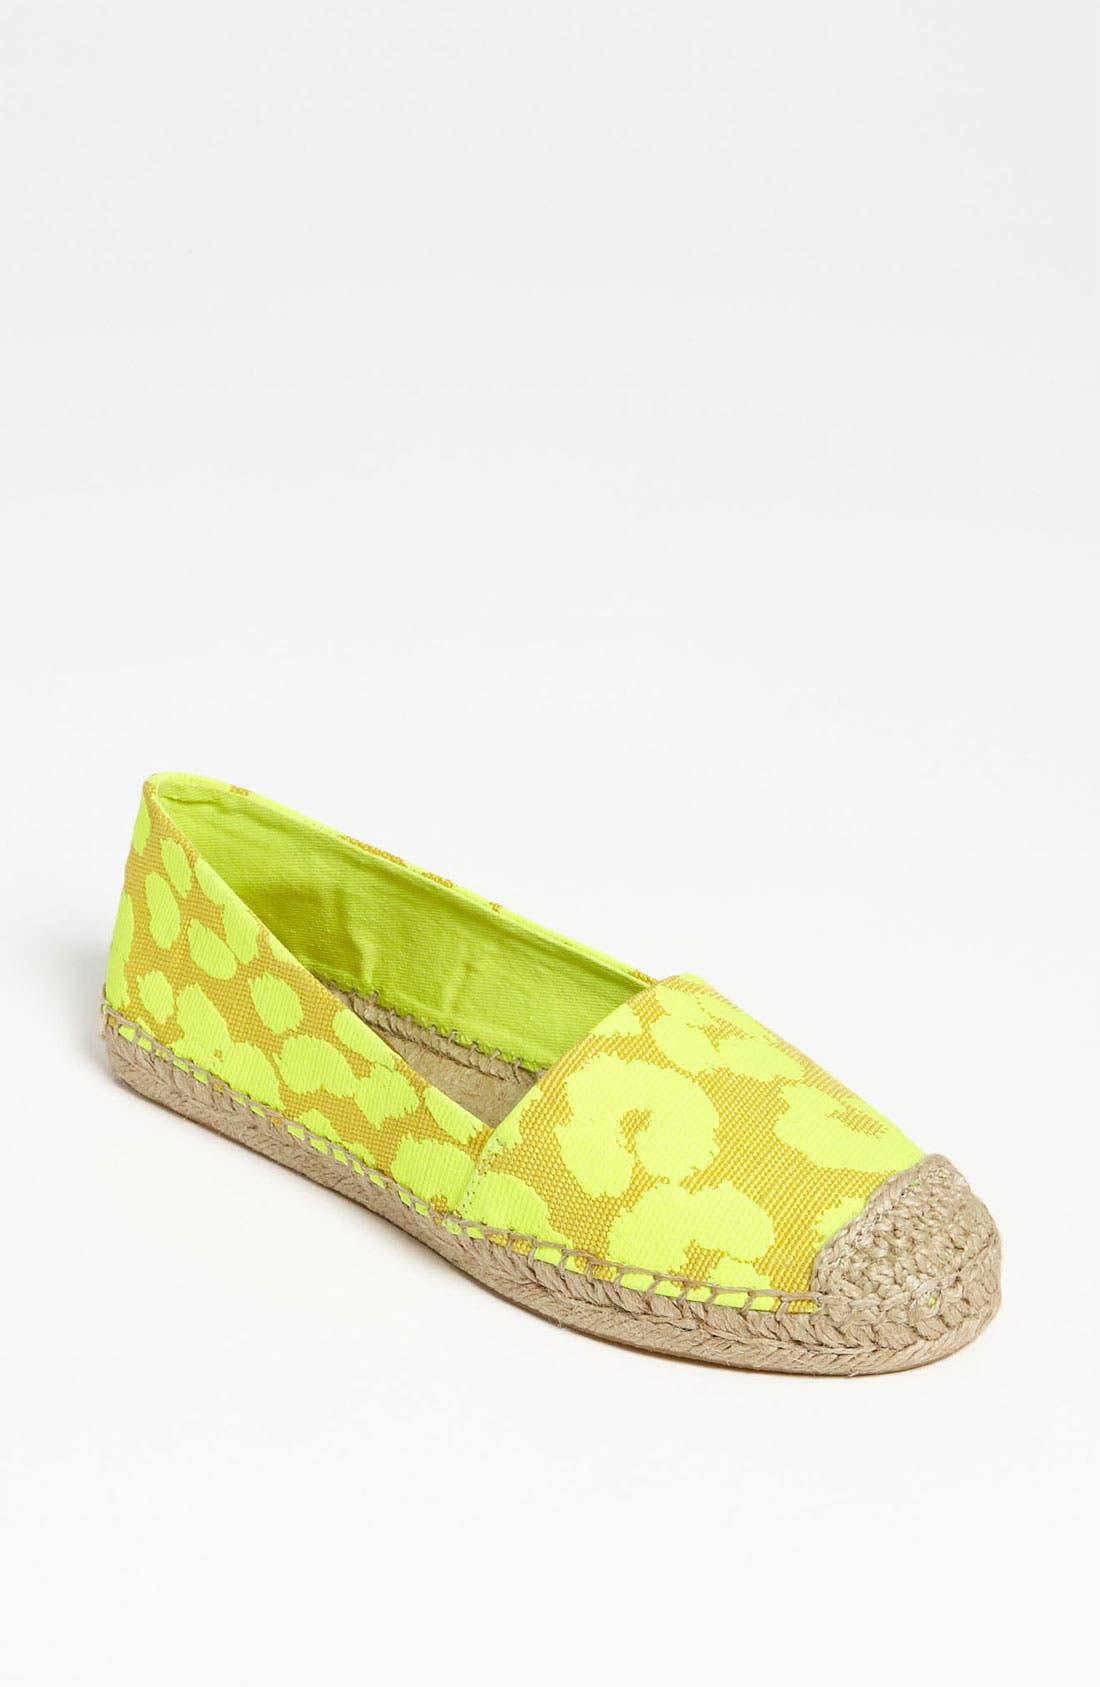 Main Image - Juicy Couture 'Gigi' Espadrille Flat